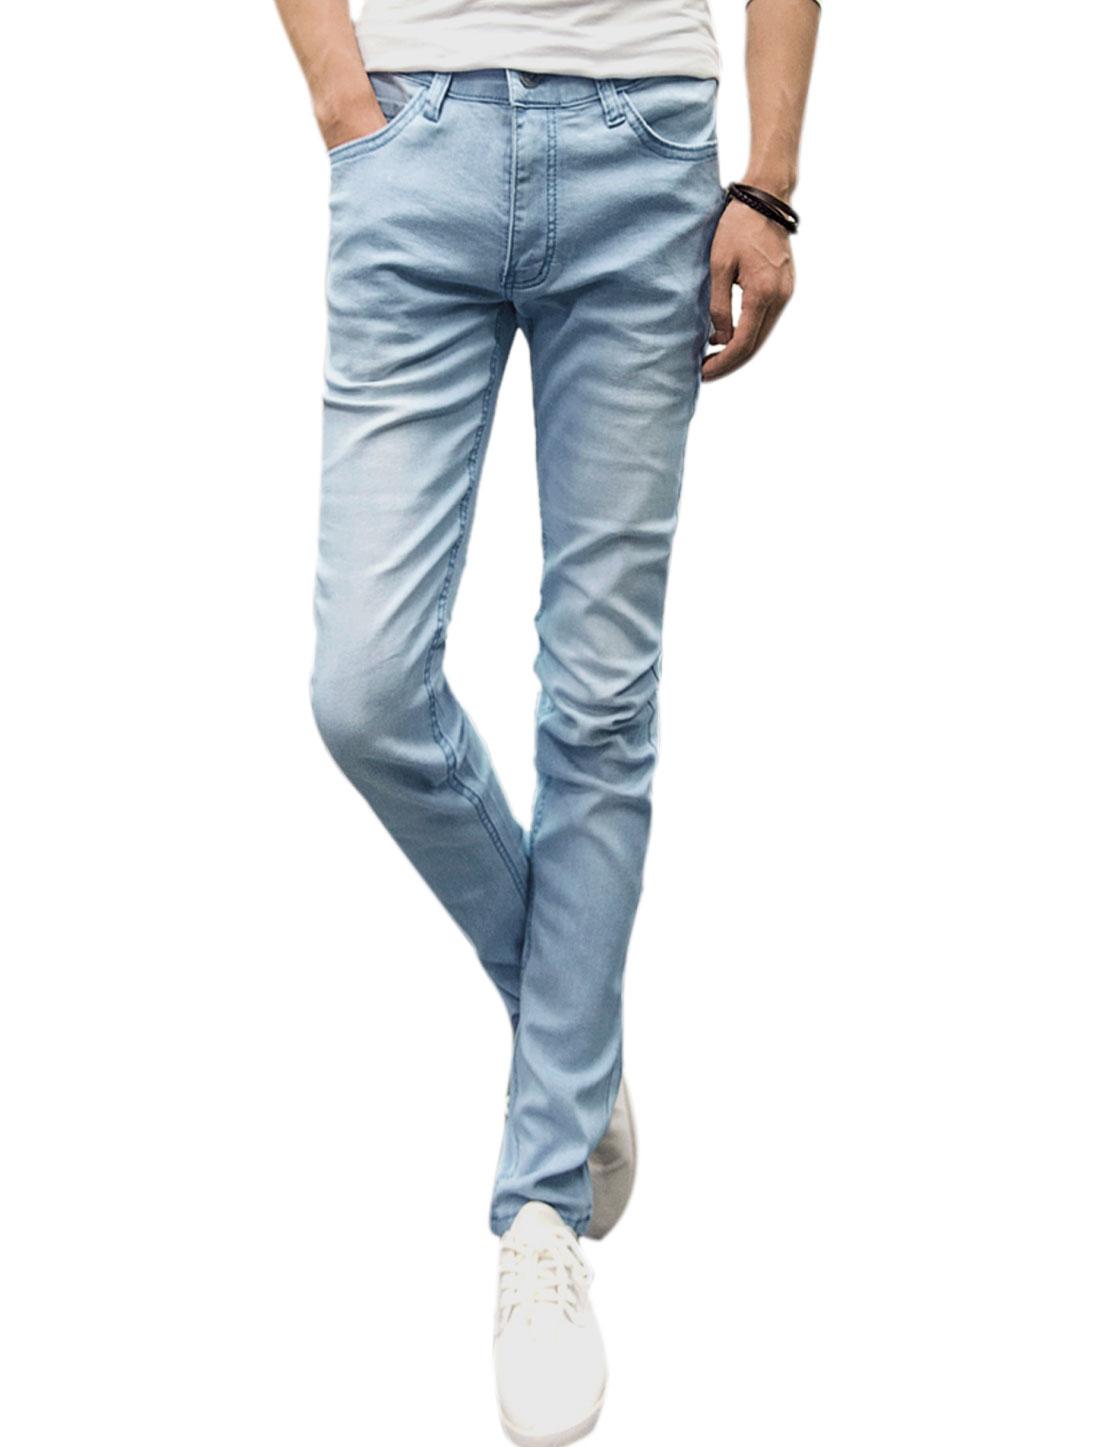 Men Mid Rise Zip Fly Classic Five Pockets Belt Loop Casual Jeans Light Blue W32